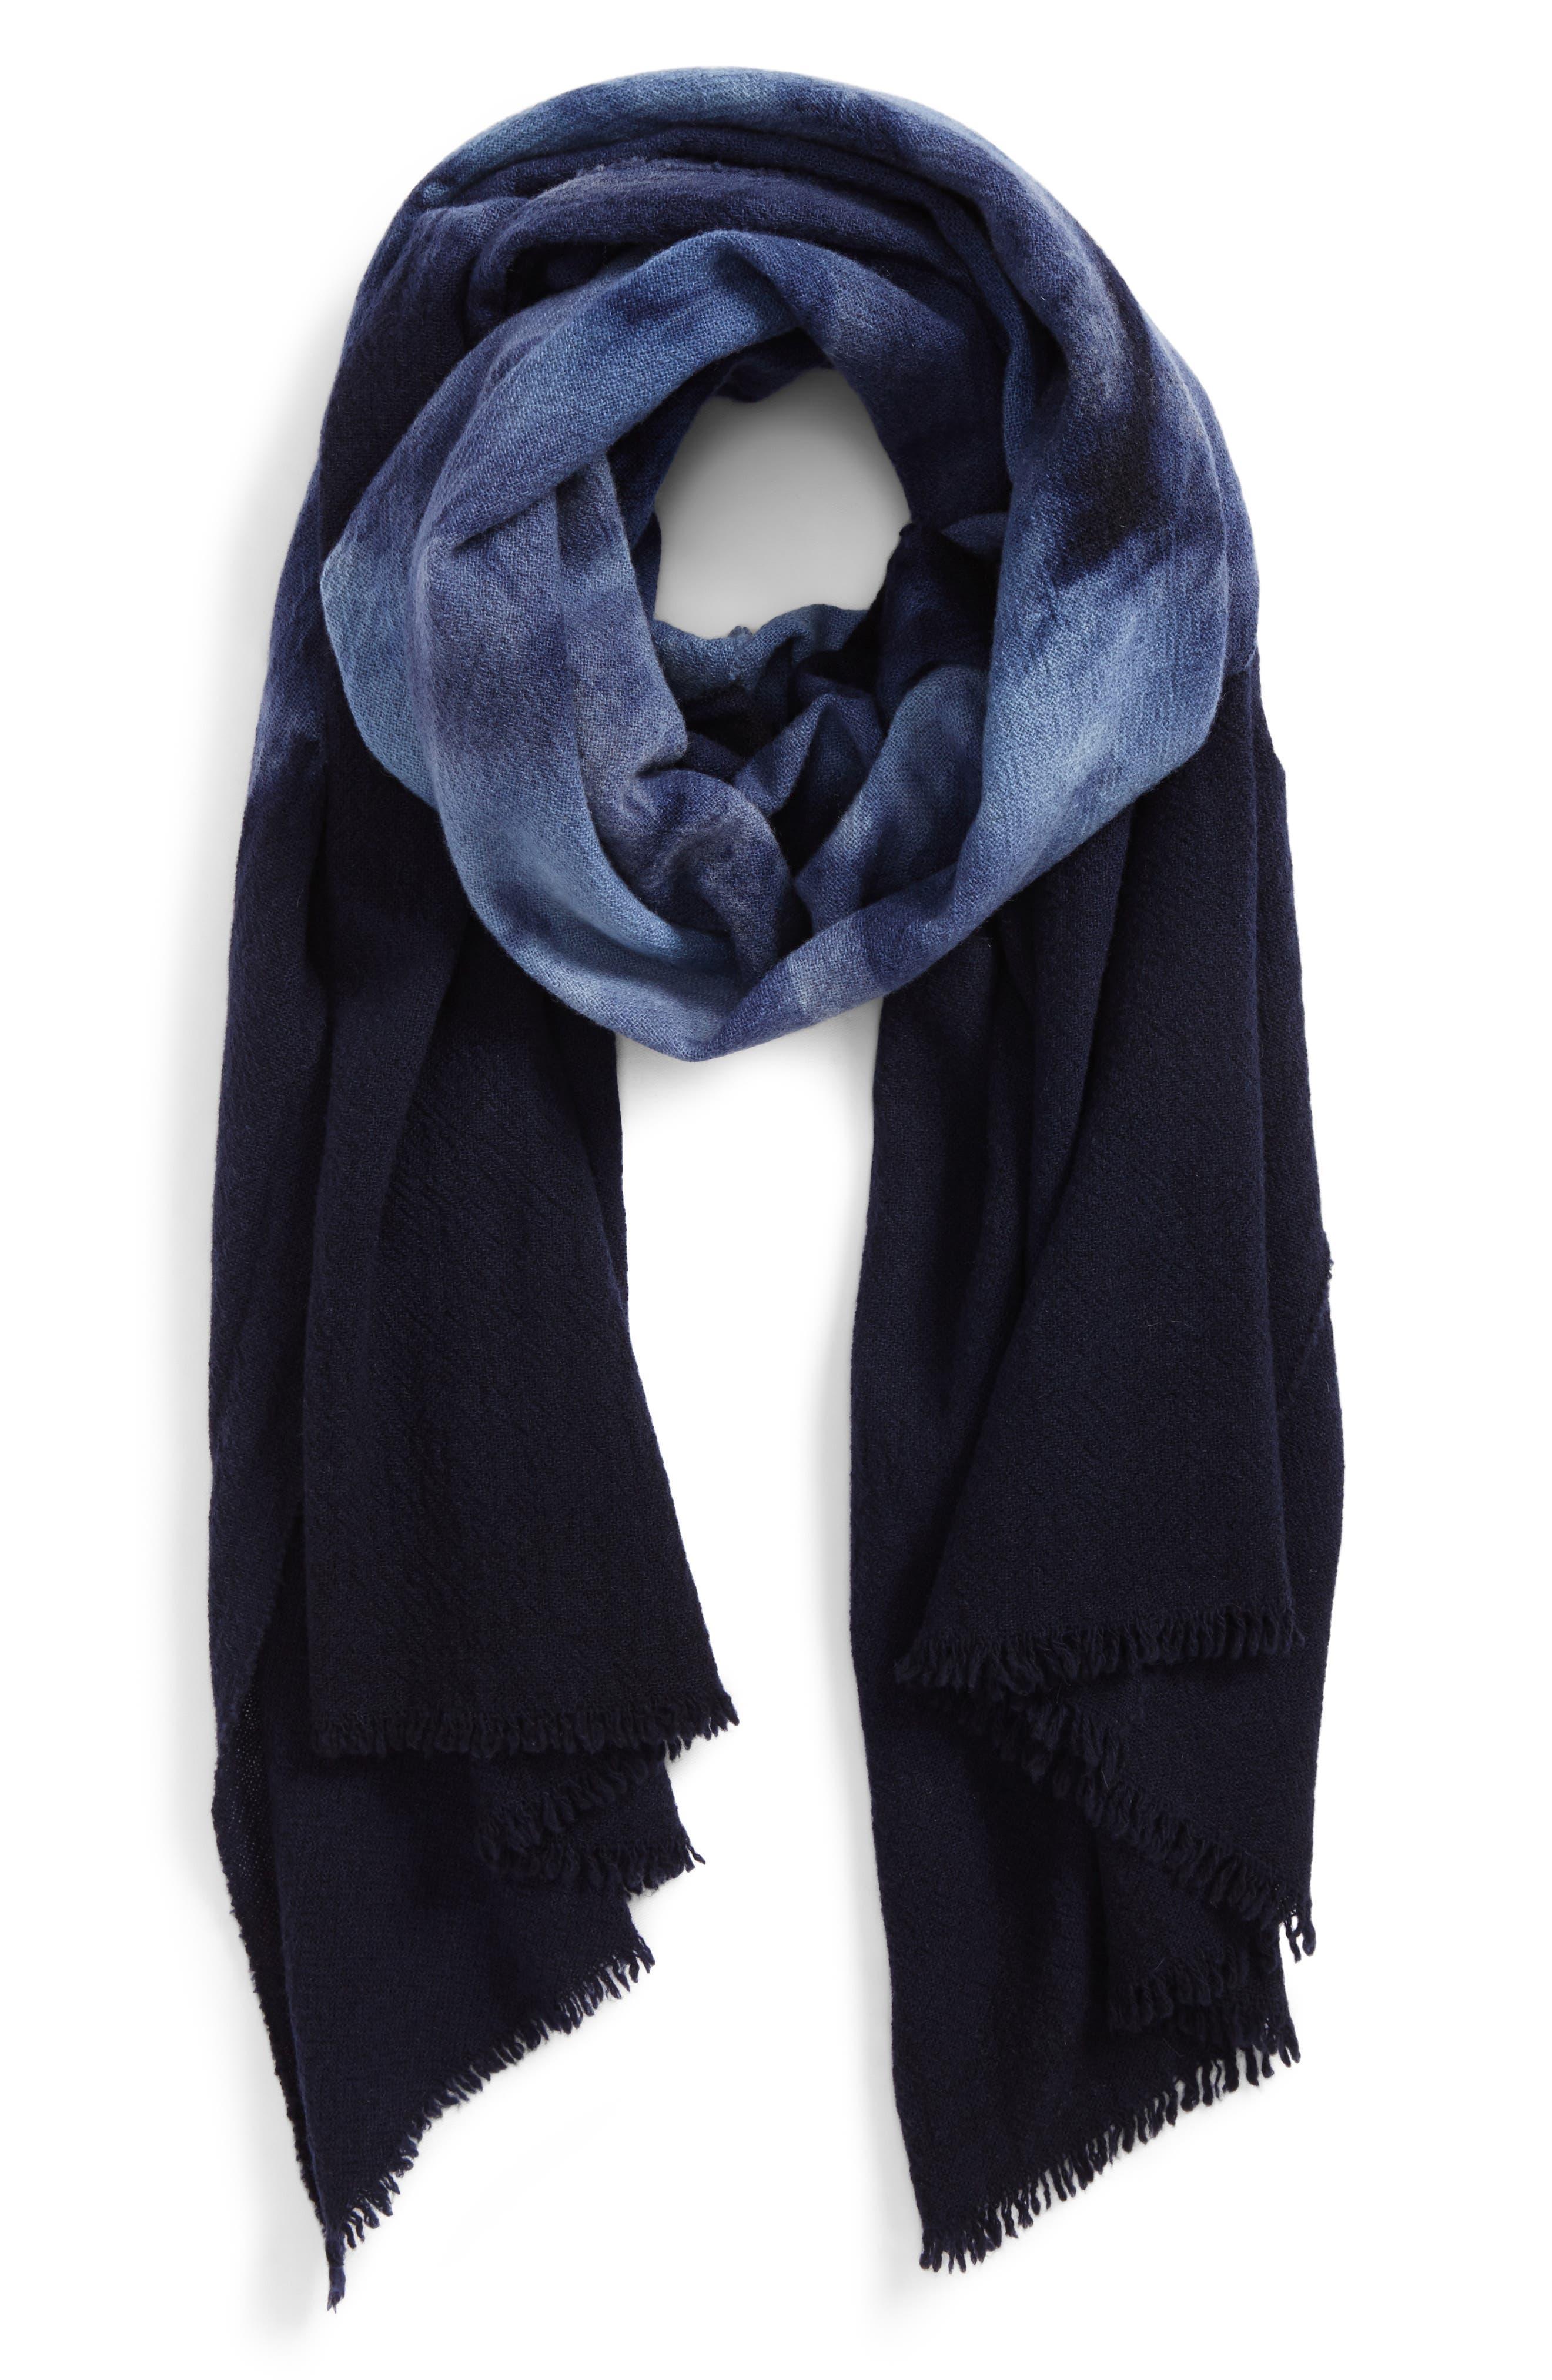 Main Image - Paul Smith Tie Dye Wool Scarf